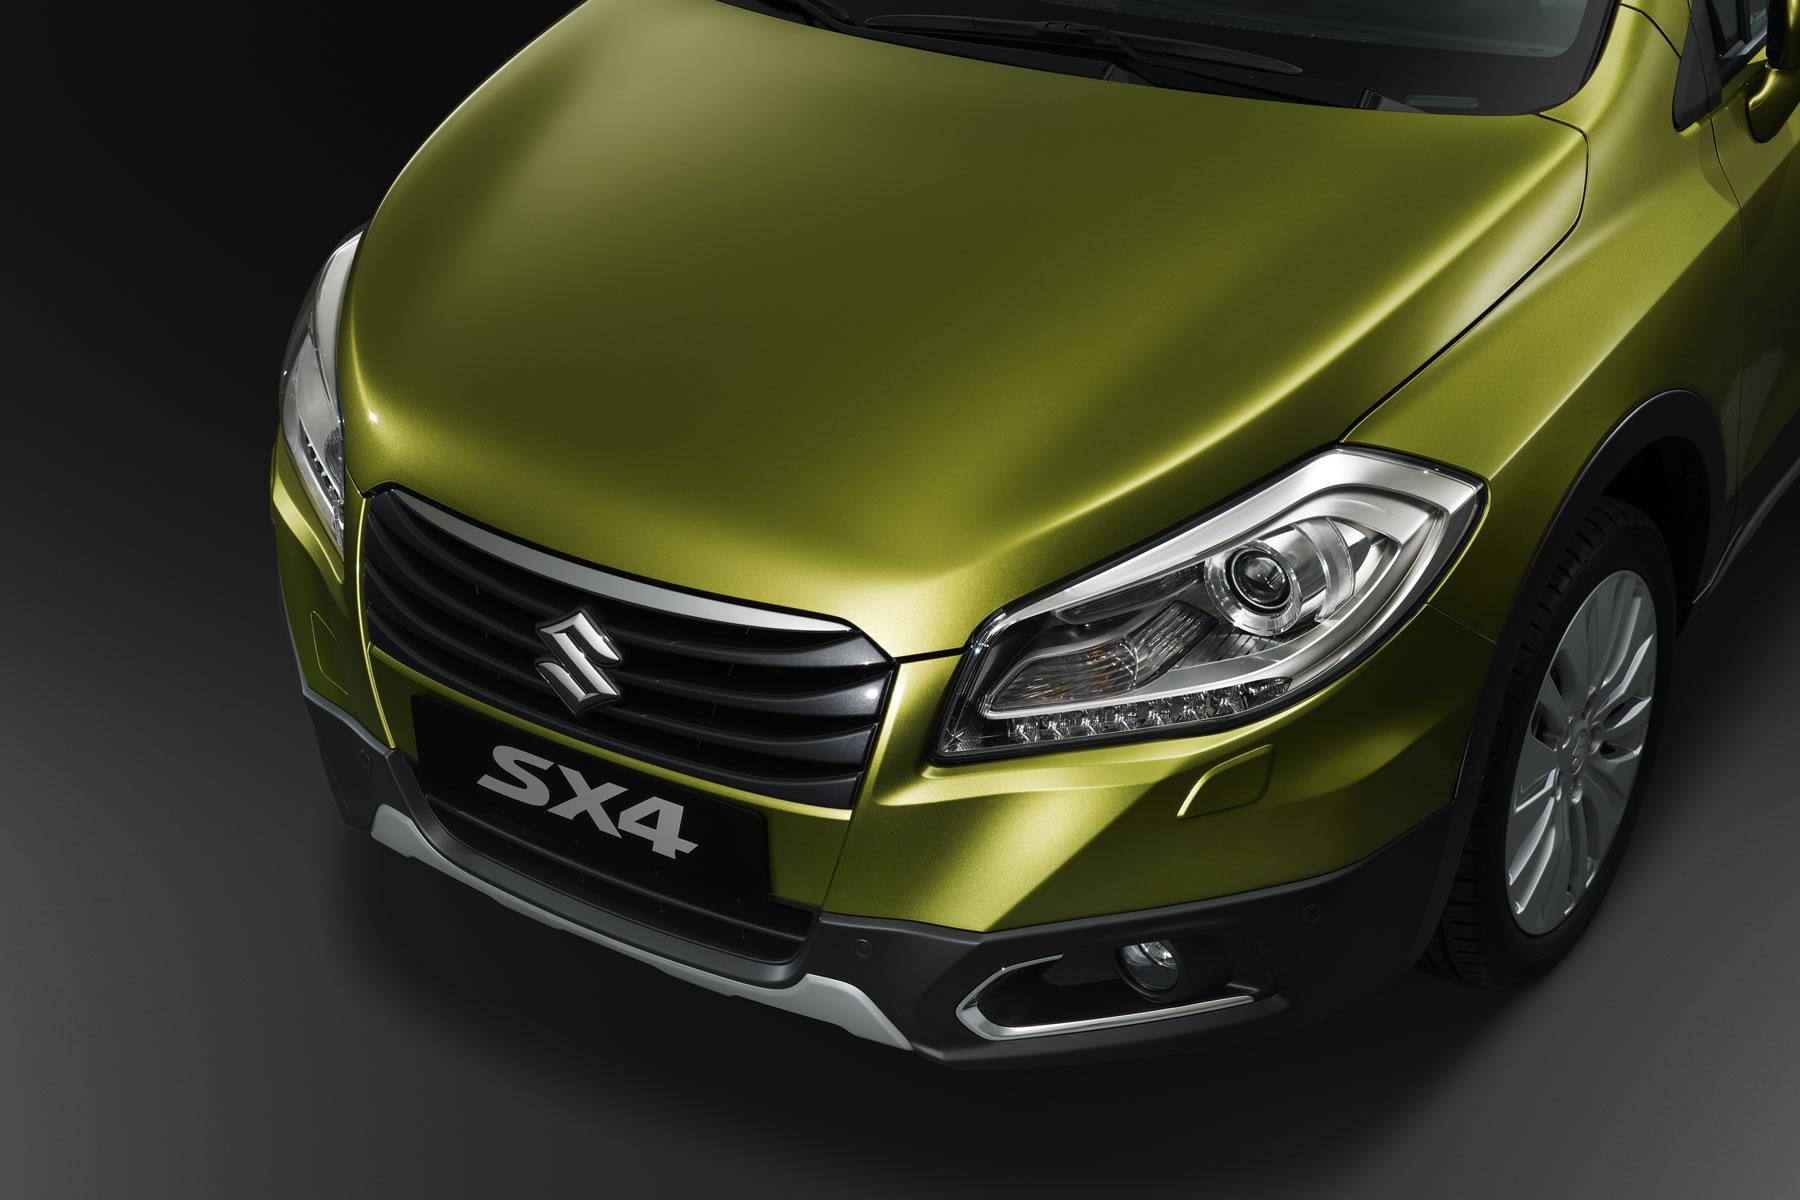 Suzuki S Cross Four_4.jpg